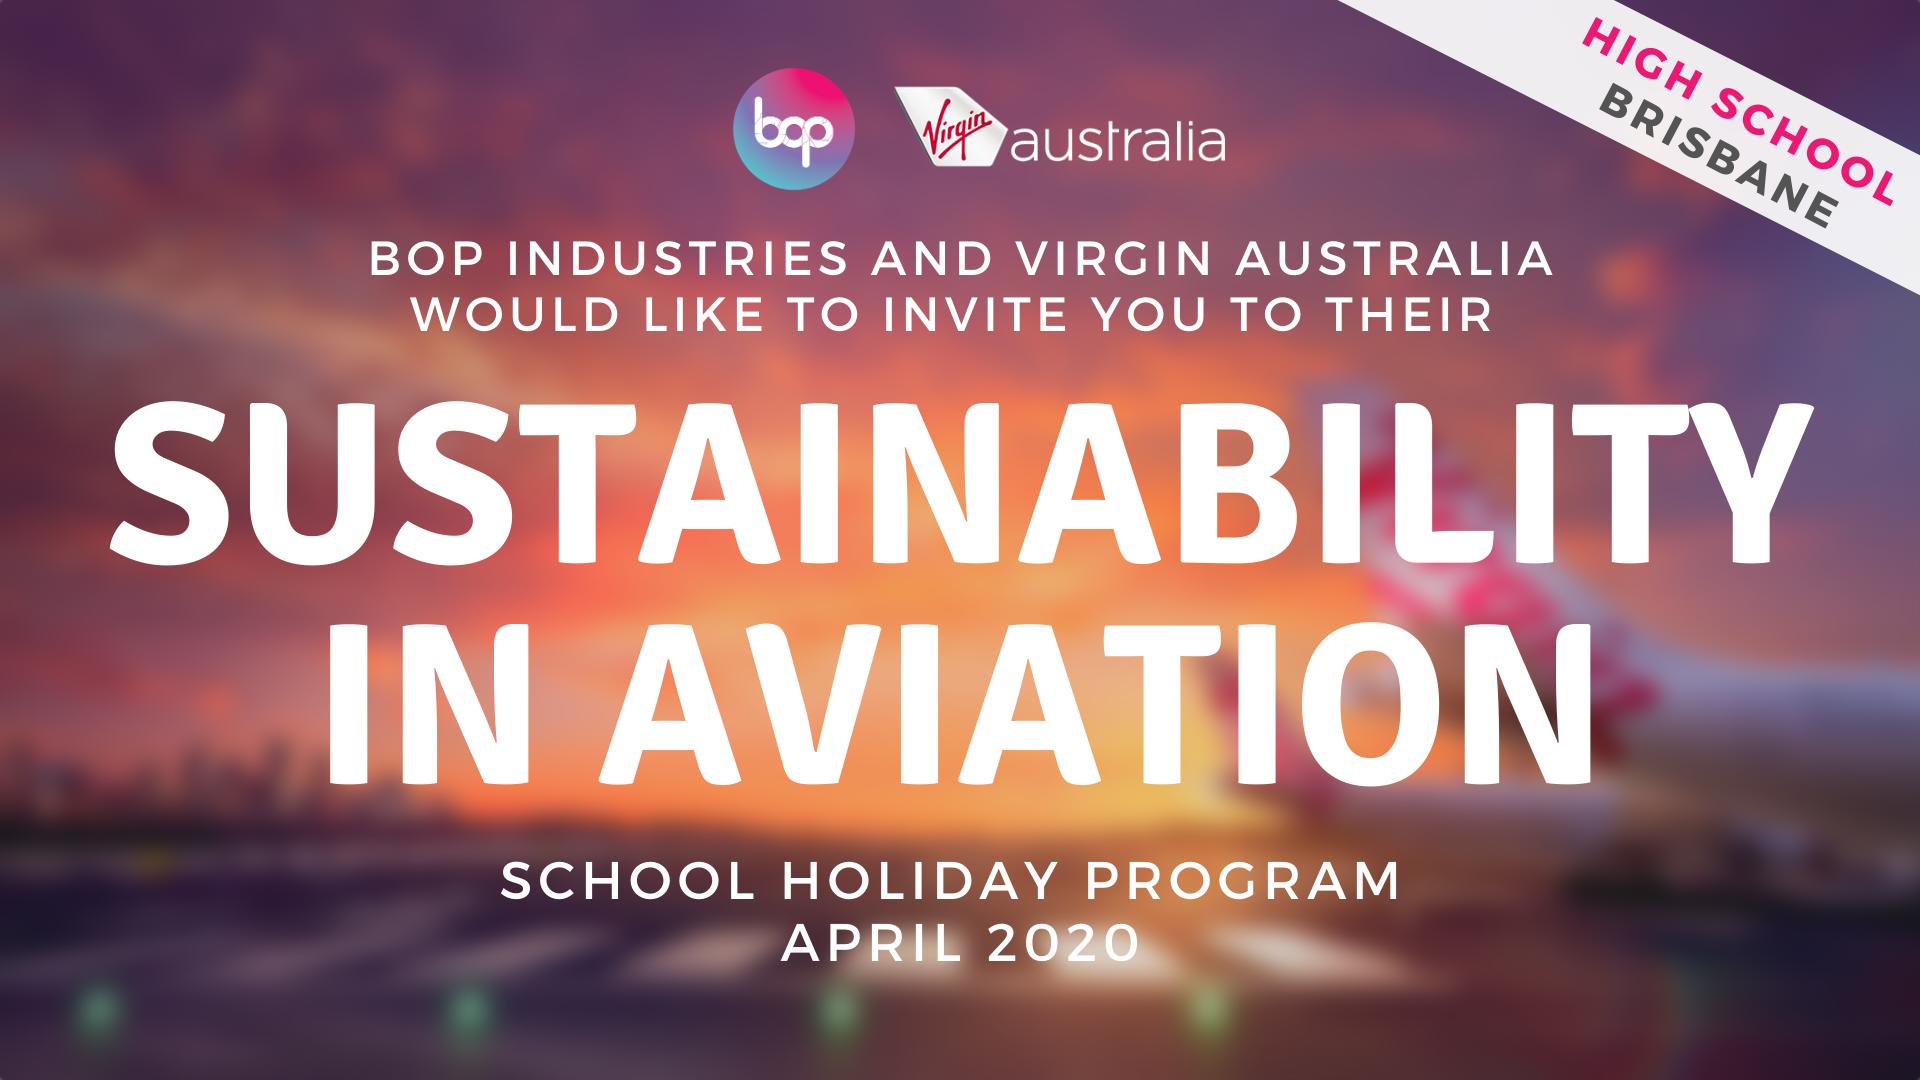 Sustainability In Aviation School Holiday Program With Virgin Australia